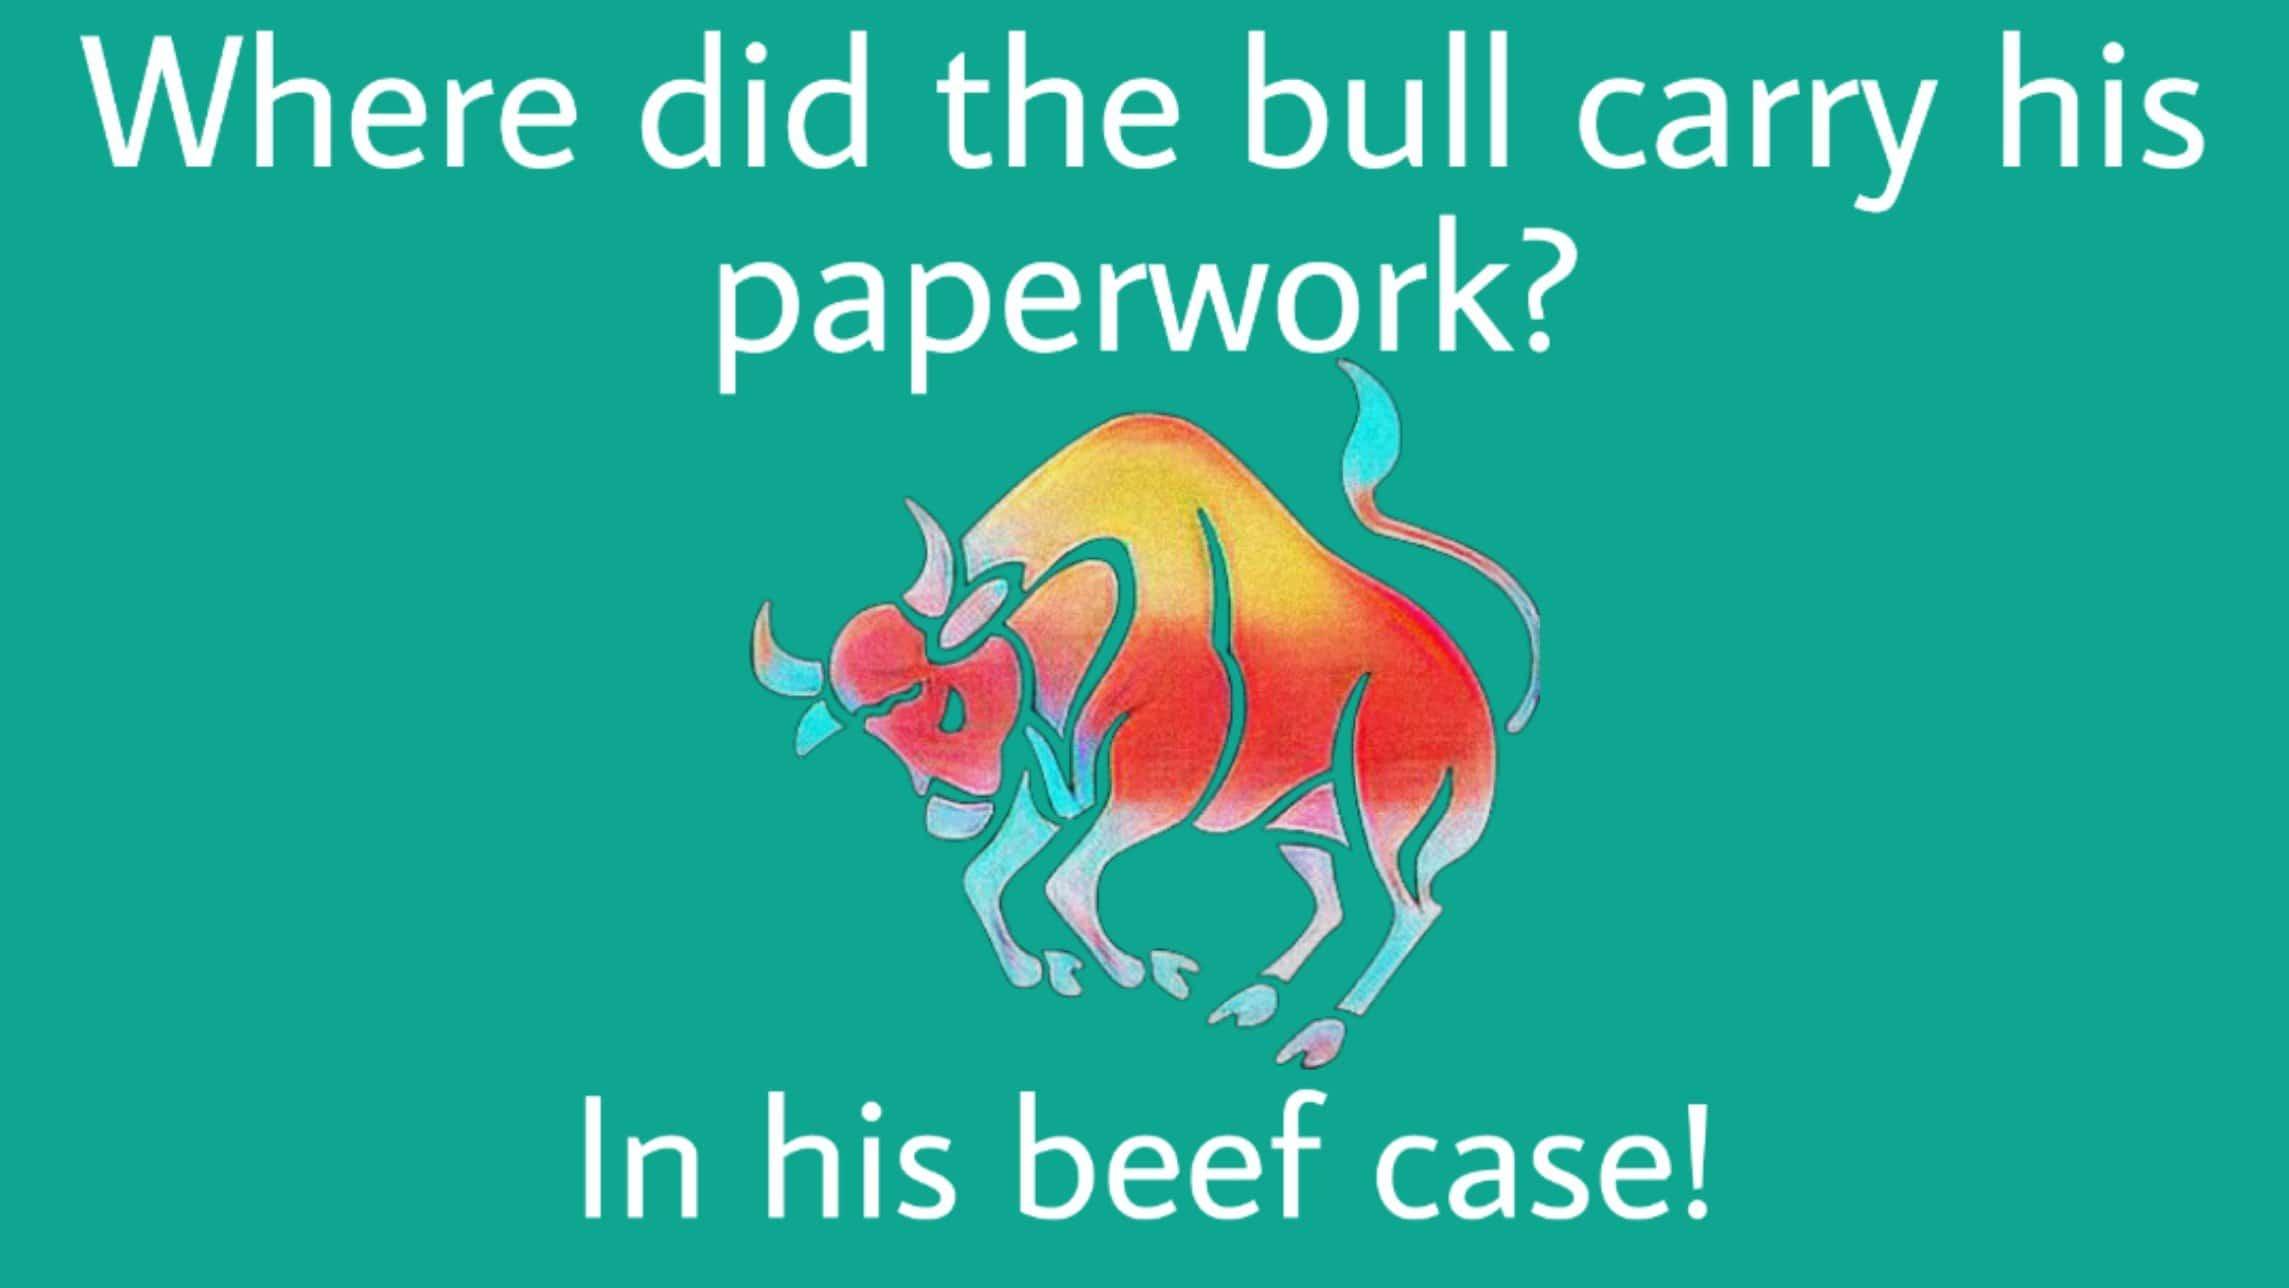 Puns about cows